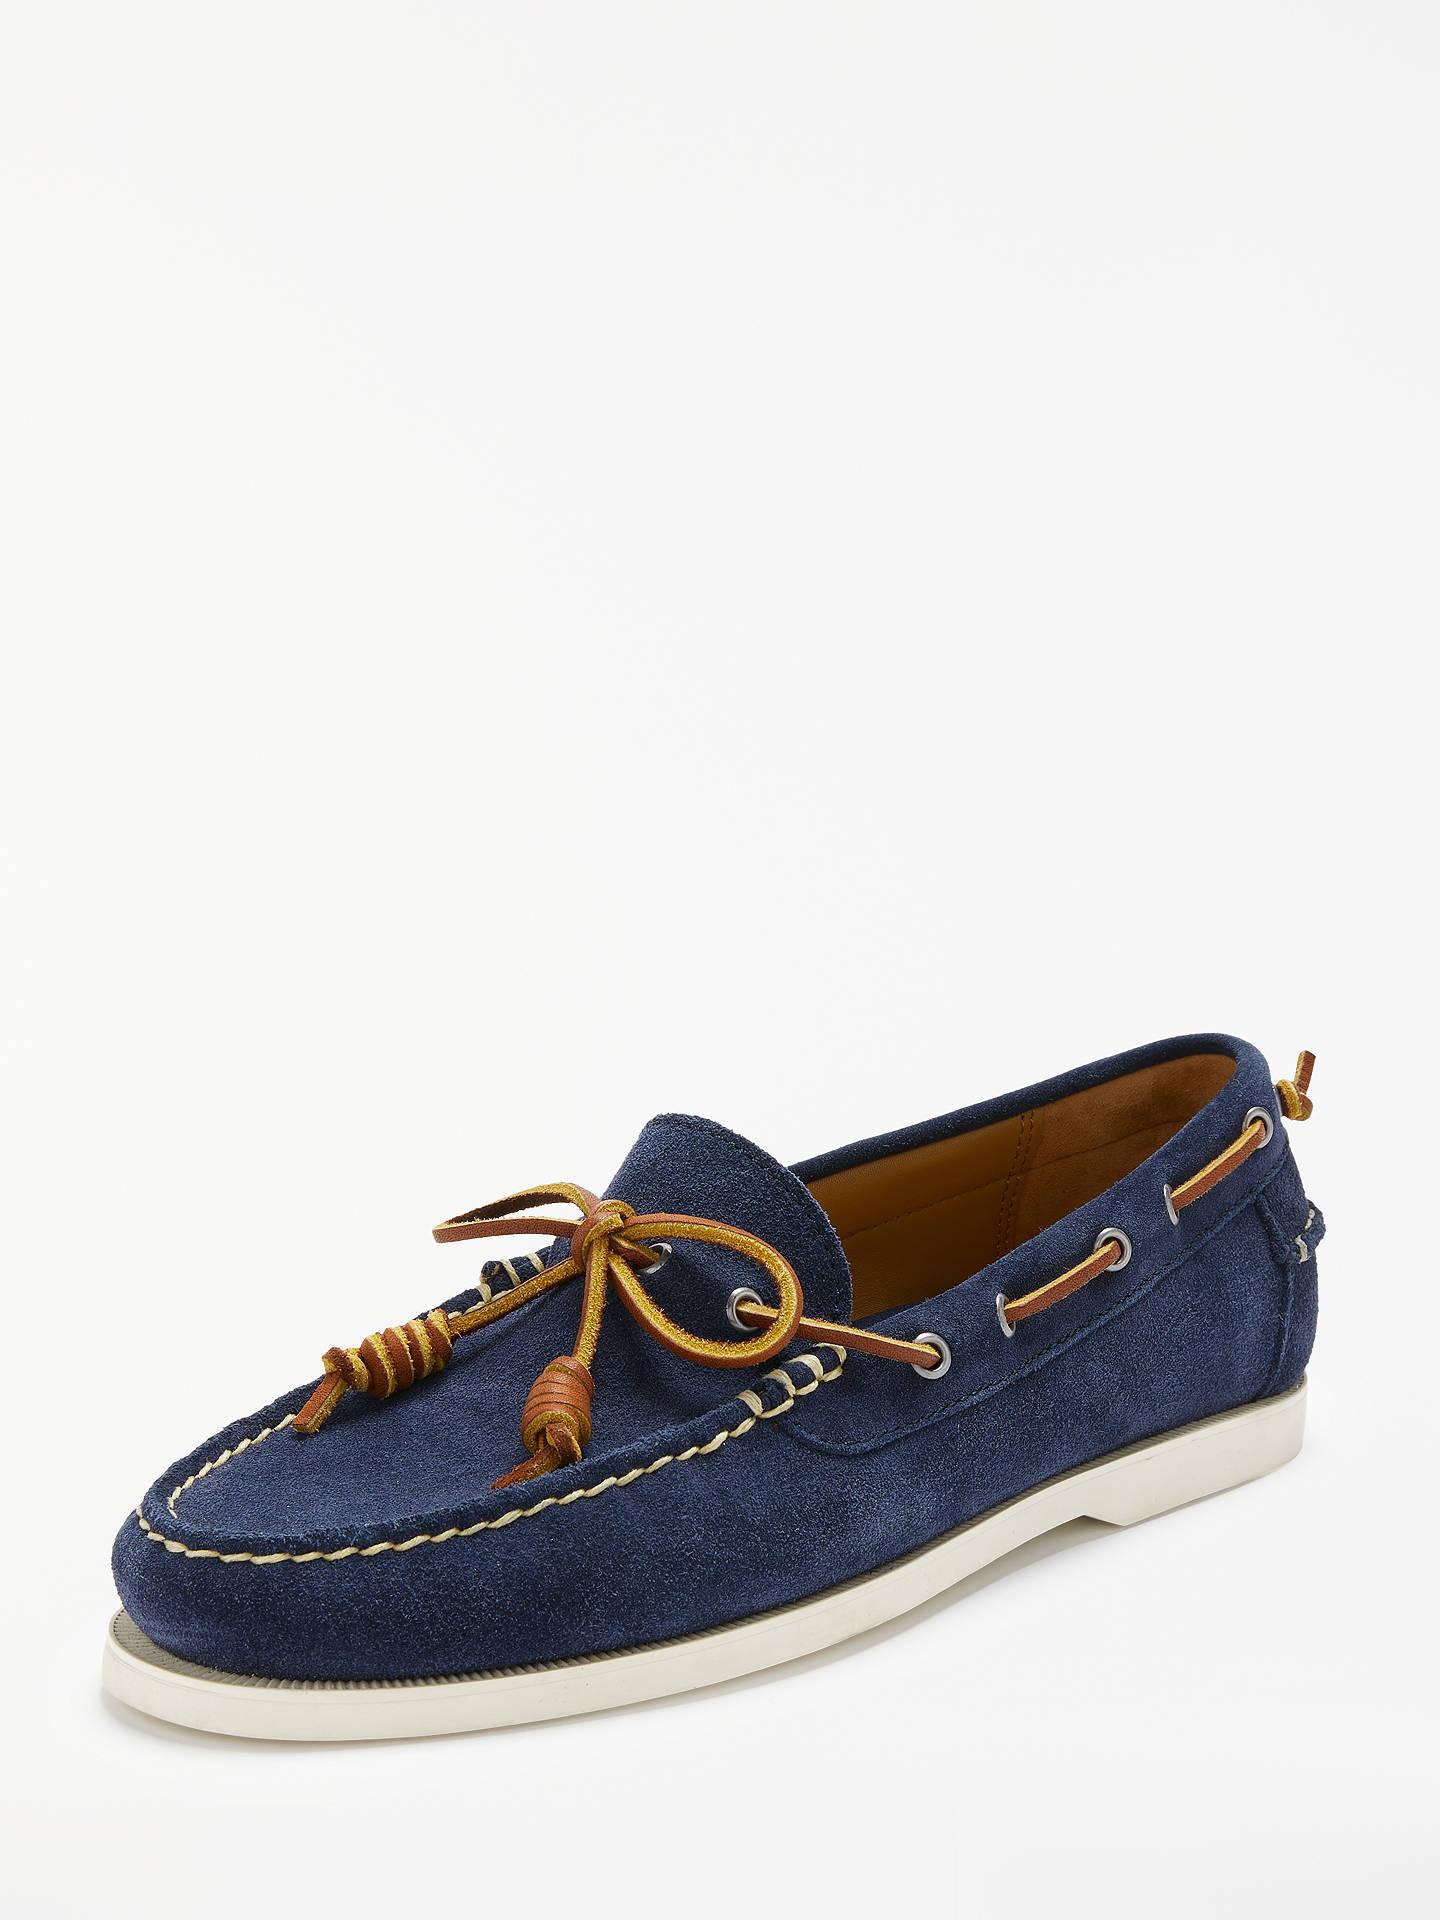 Polo Ralph Lauren Millard Suede Boat Shoes at John Lewis   Partners 97551dd160d